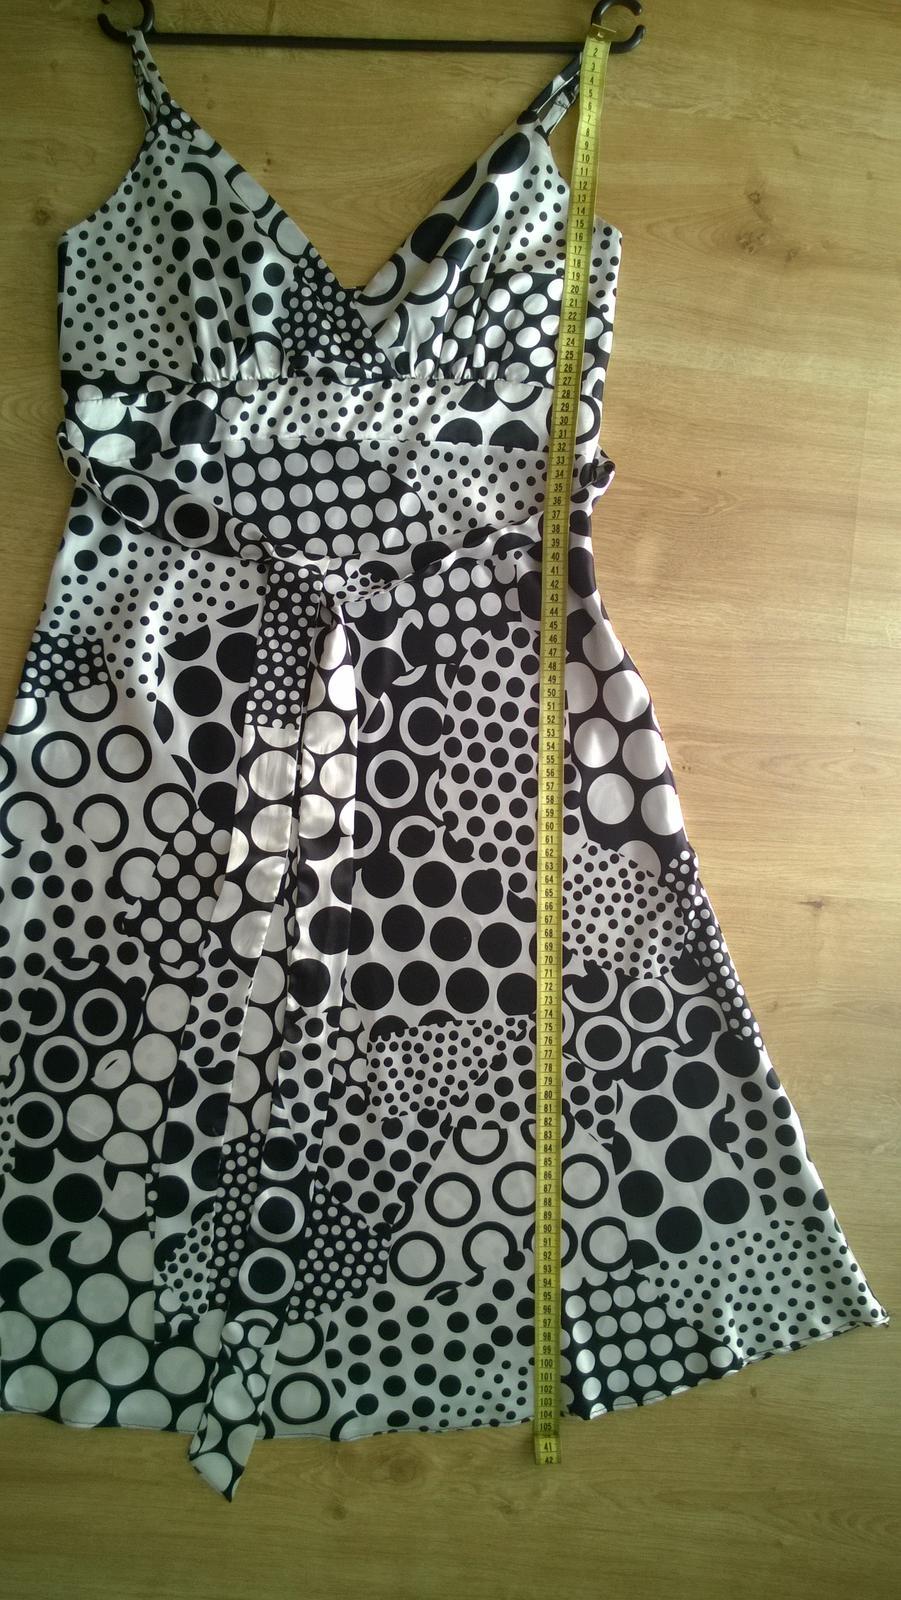 Saténové šaty  - Obrázok č. 4